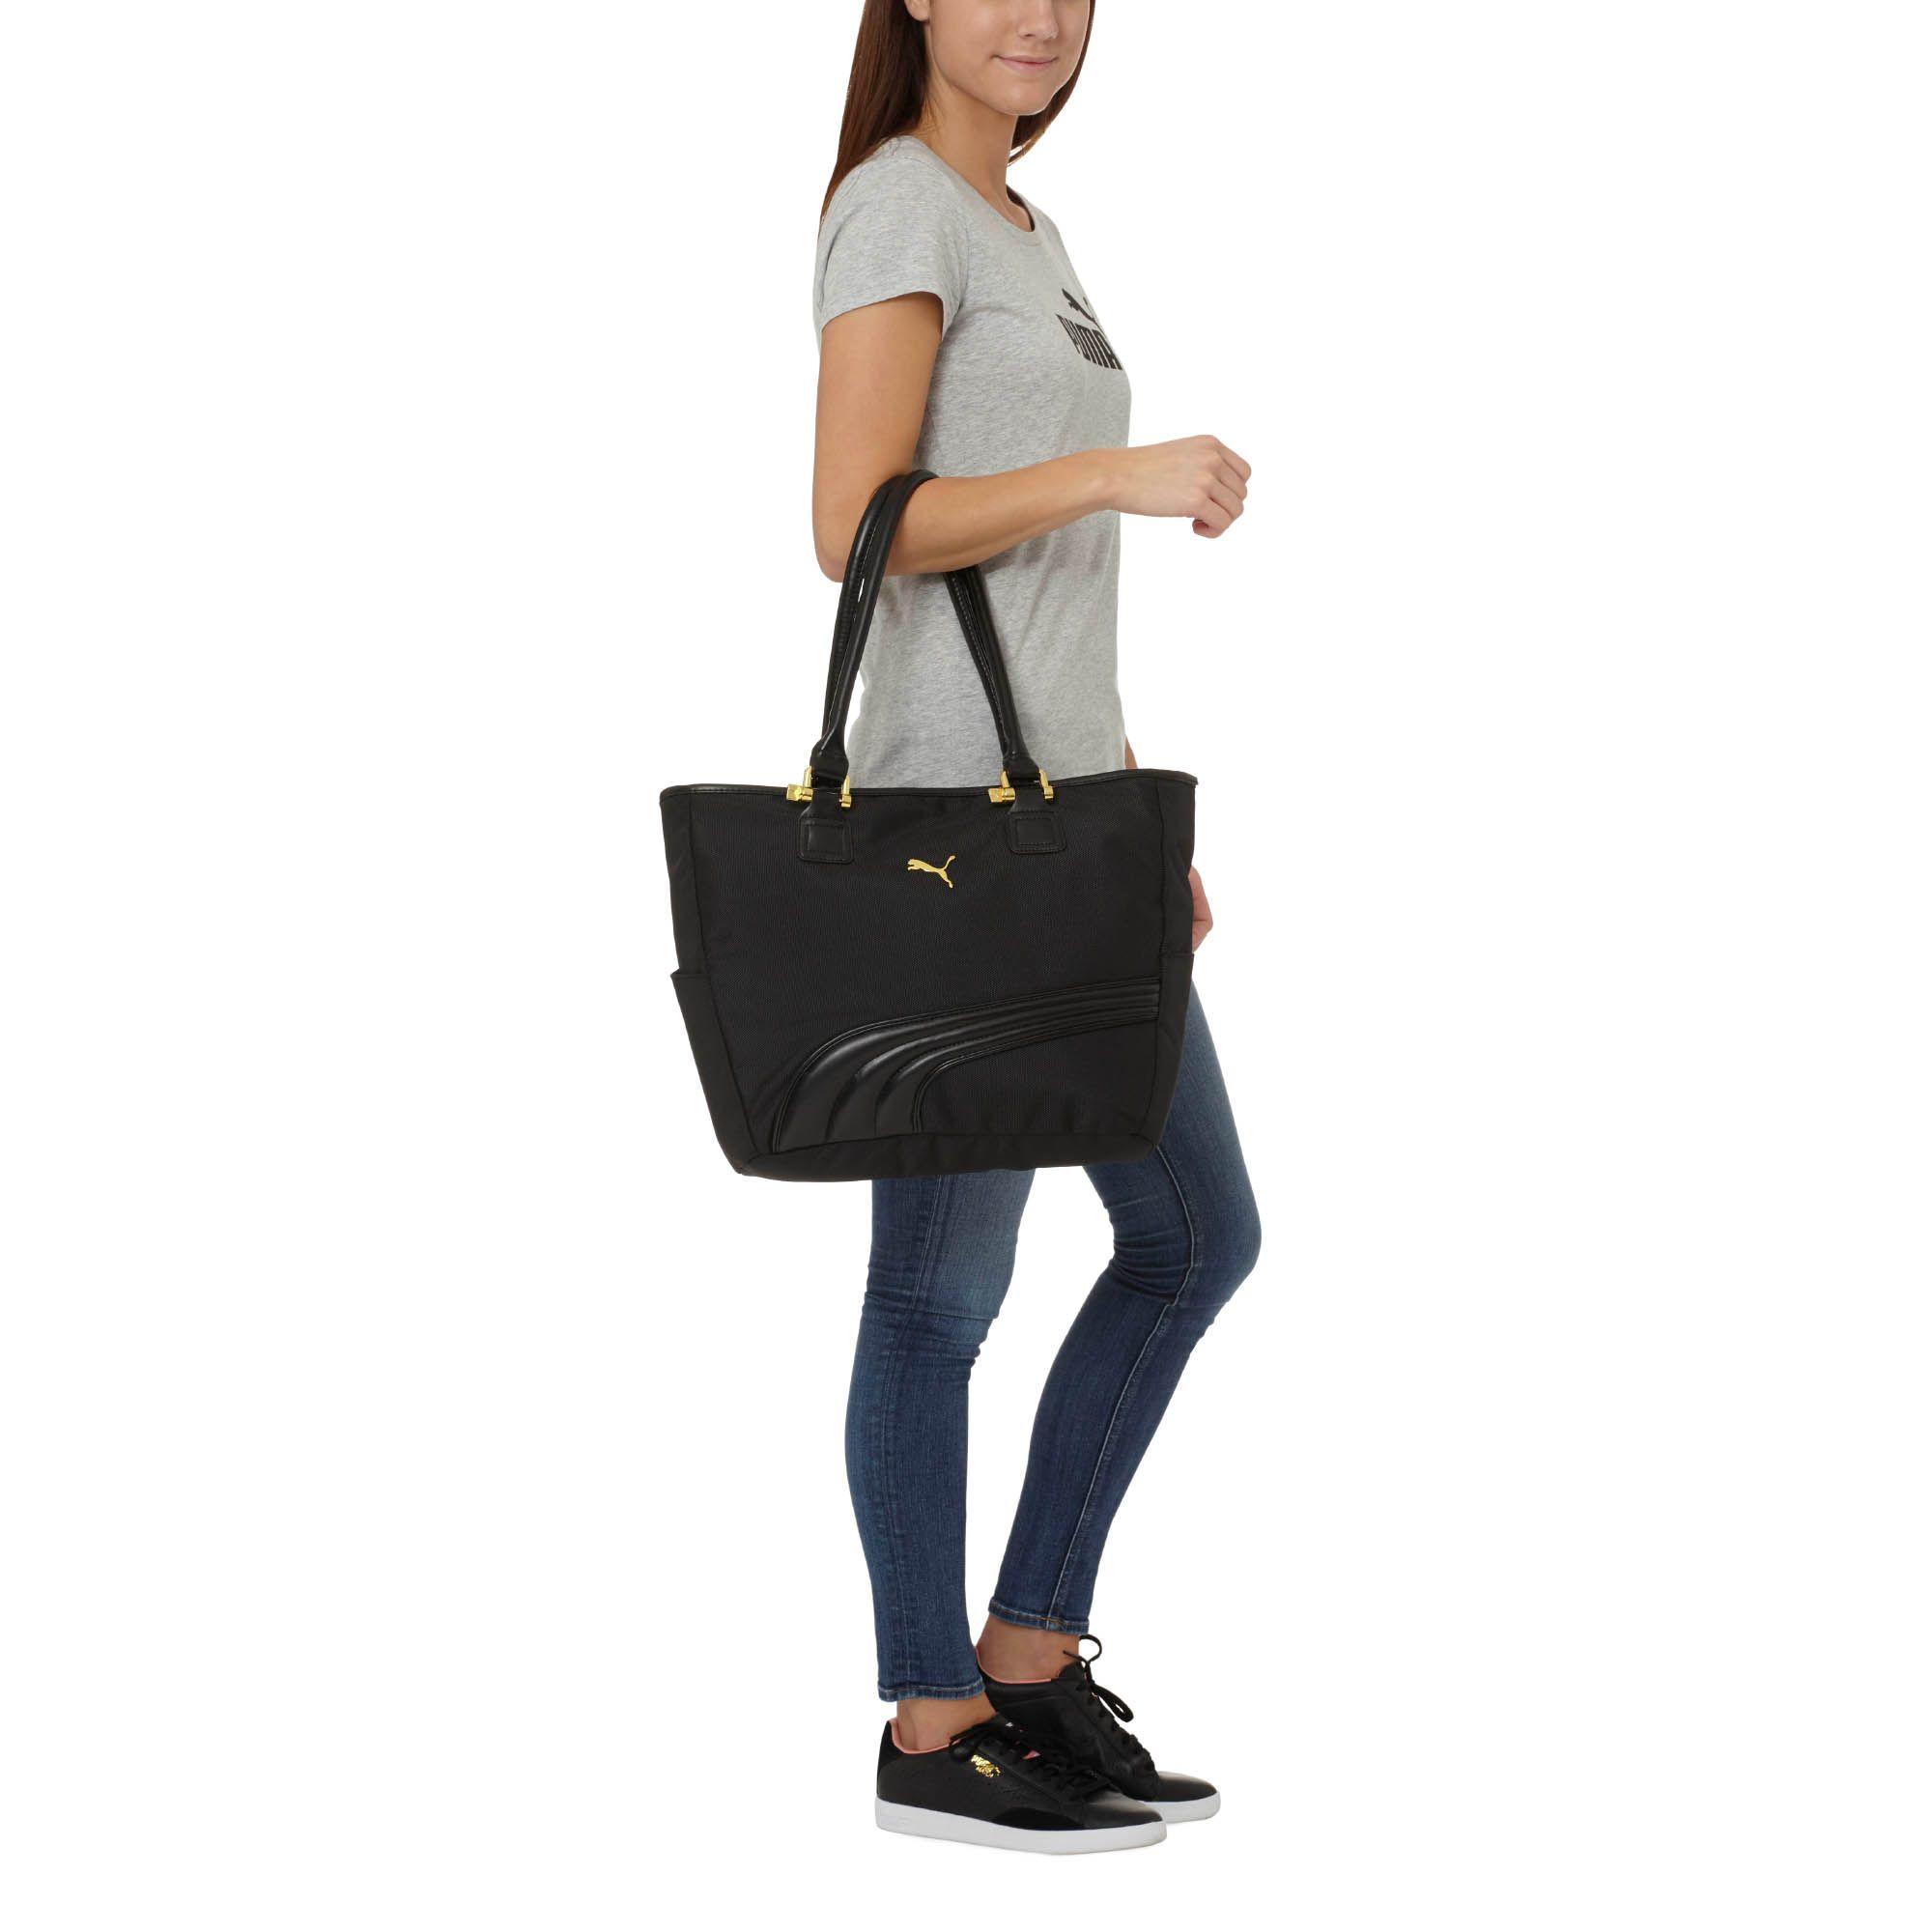 Lyst - PUMA Cartel Tote Bag in Orange 4111720db3534